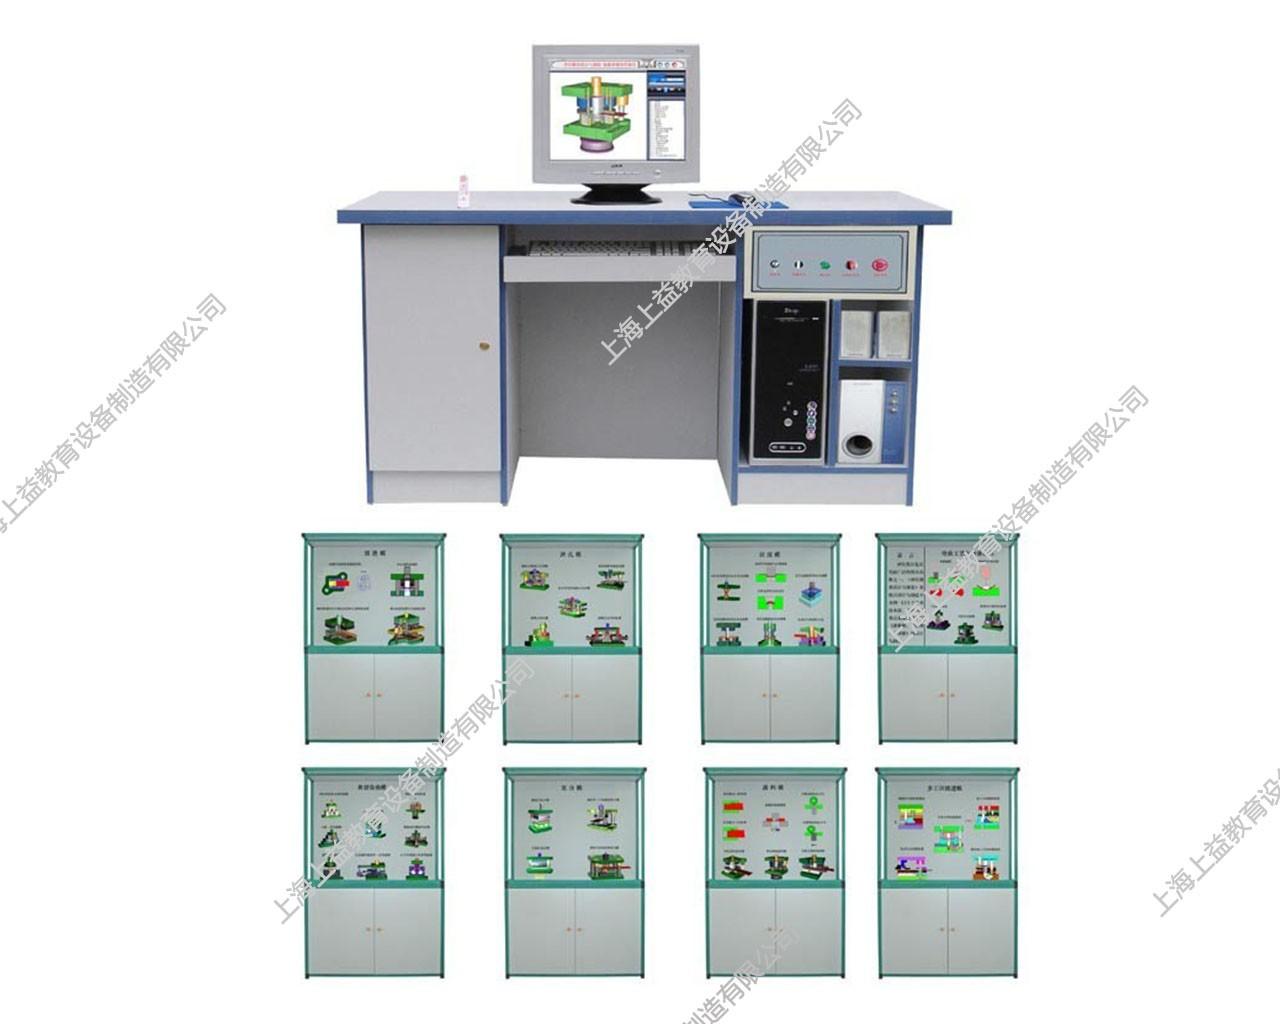 SYGLG-103 多媒体智能控制《塑料磨具设计与制造》陈列柜